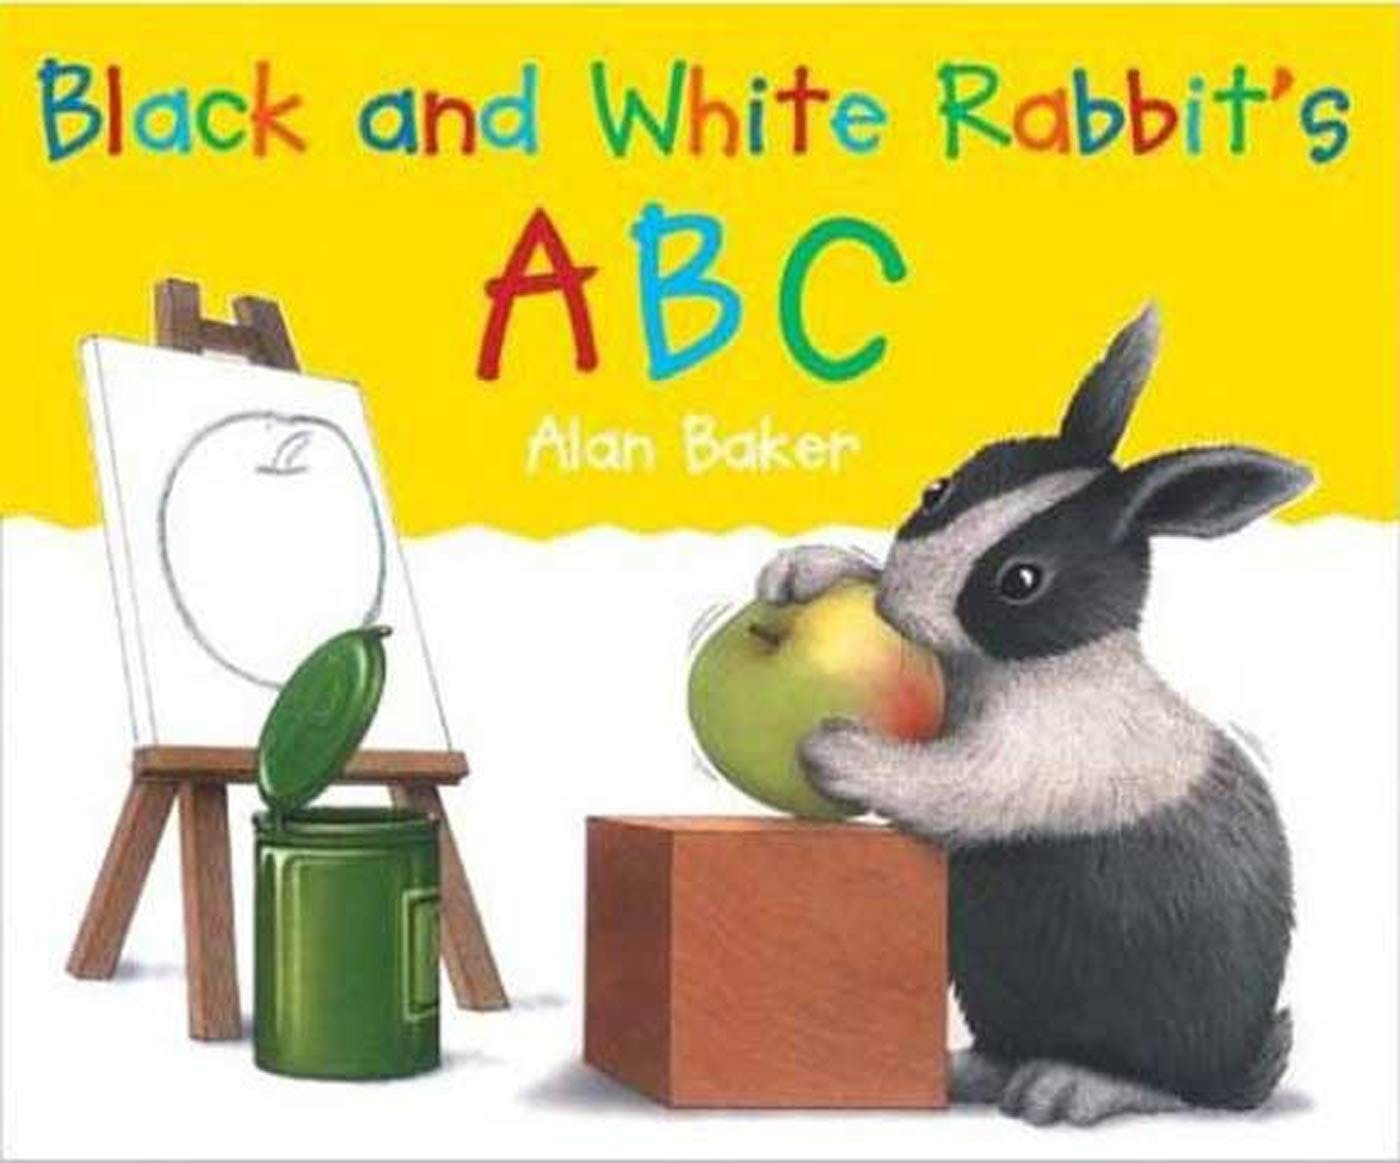 Image of Black and White Rabbit's ABC